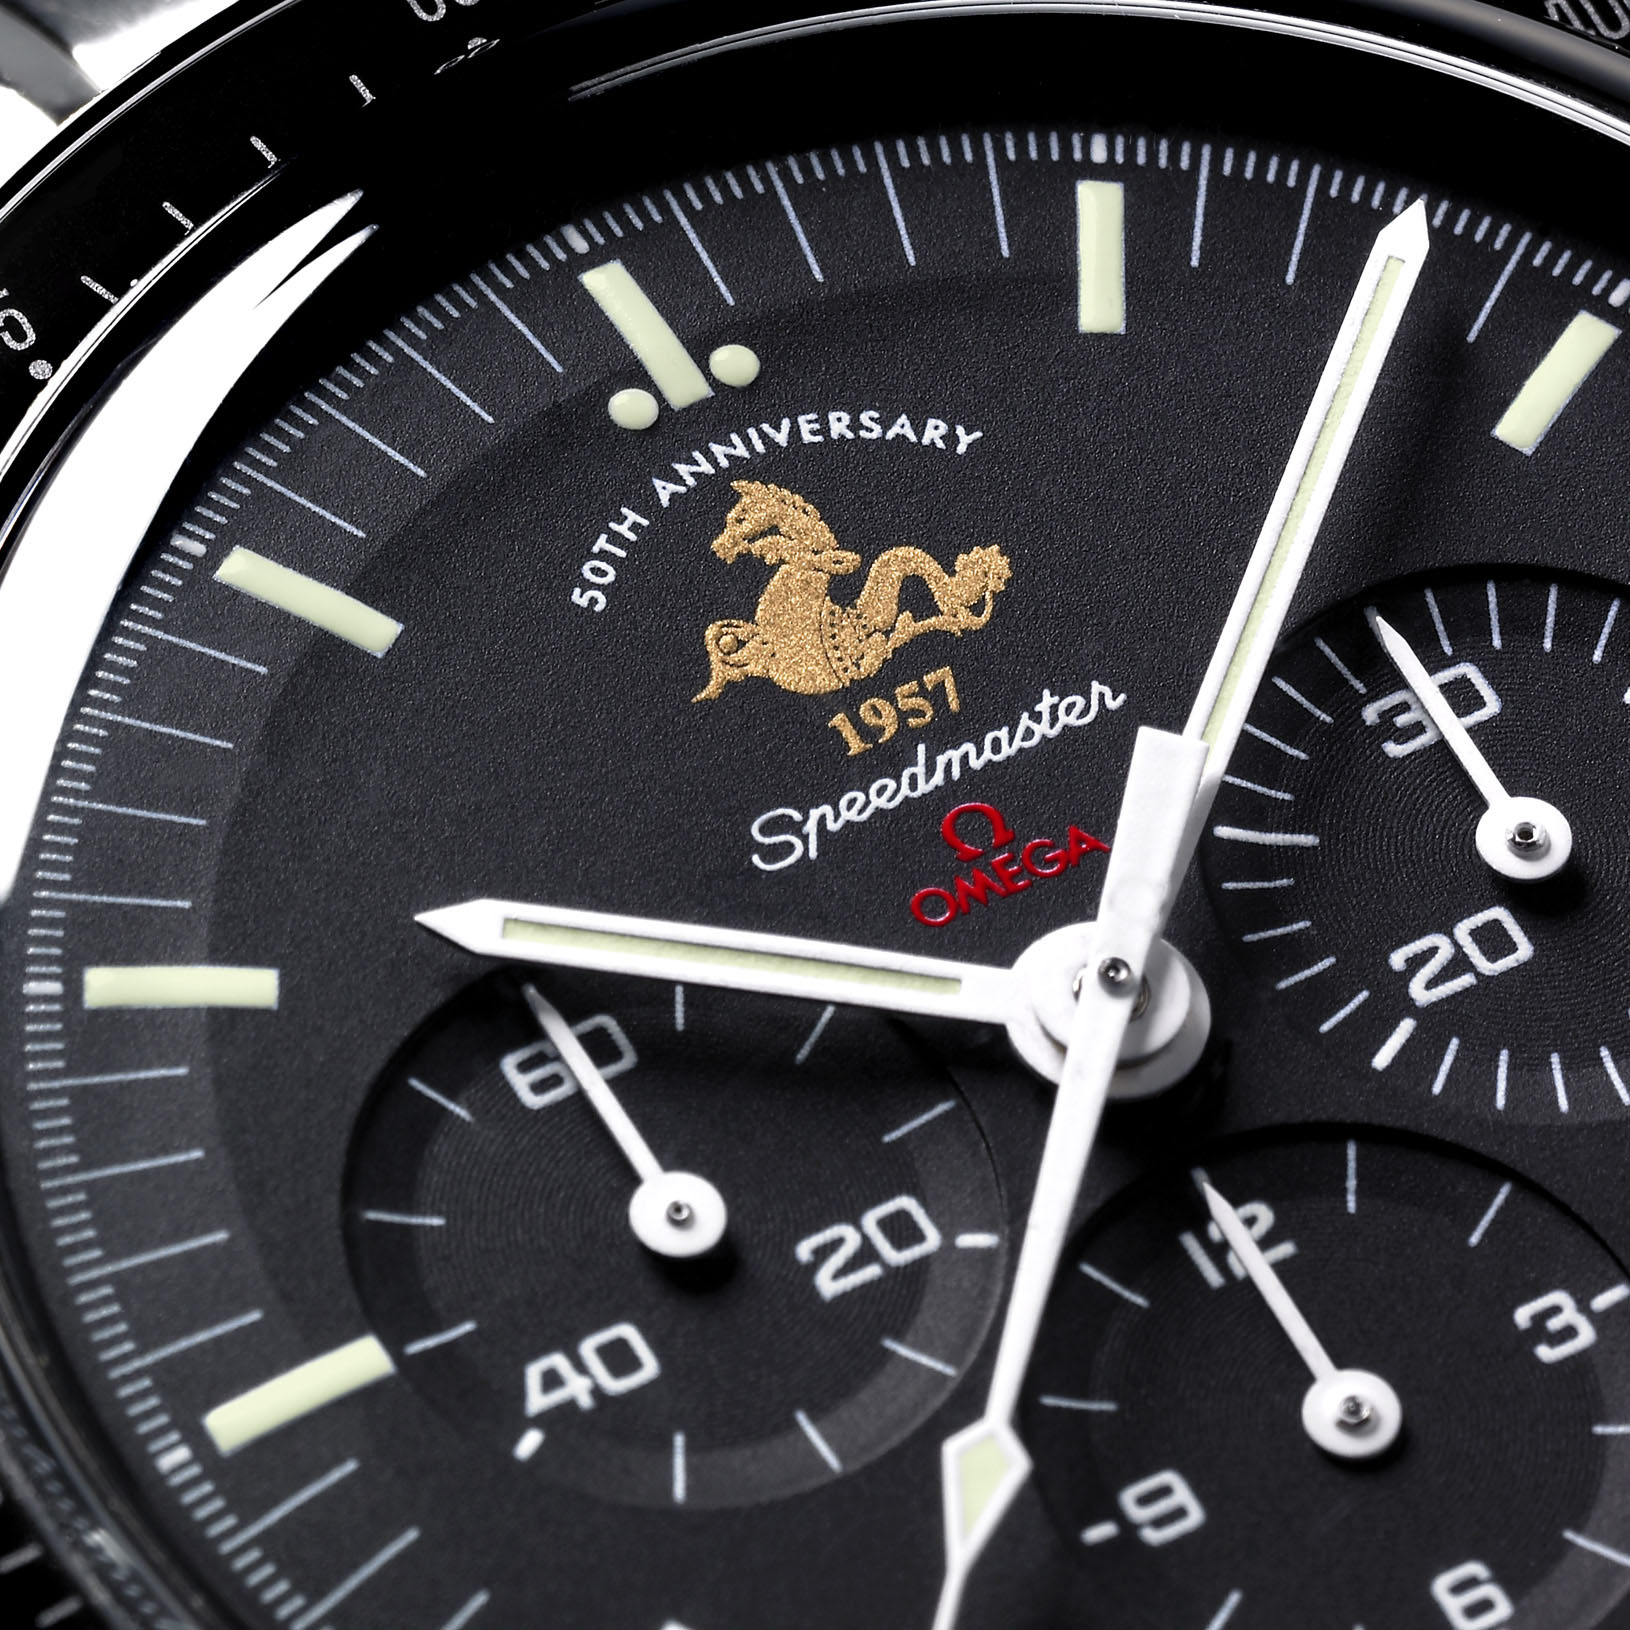 speedmaster 50th anniversary limited series